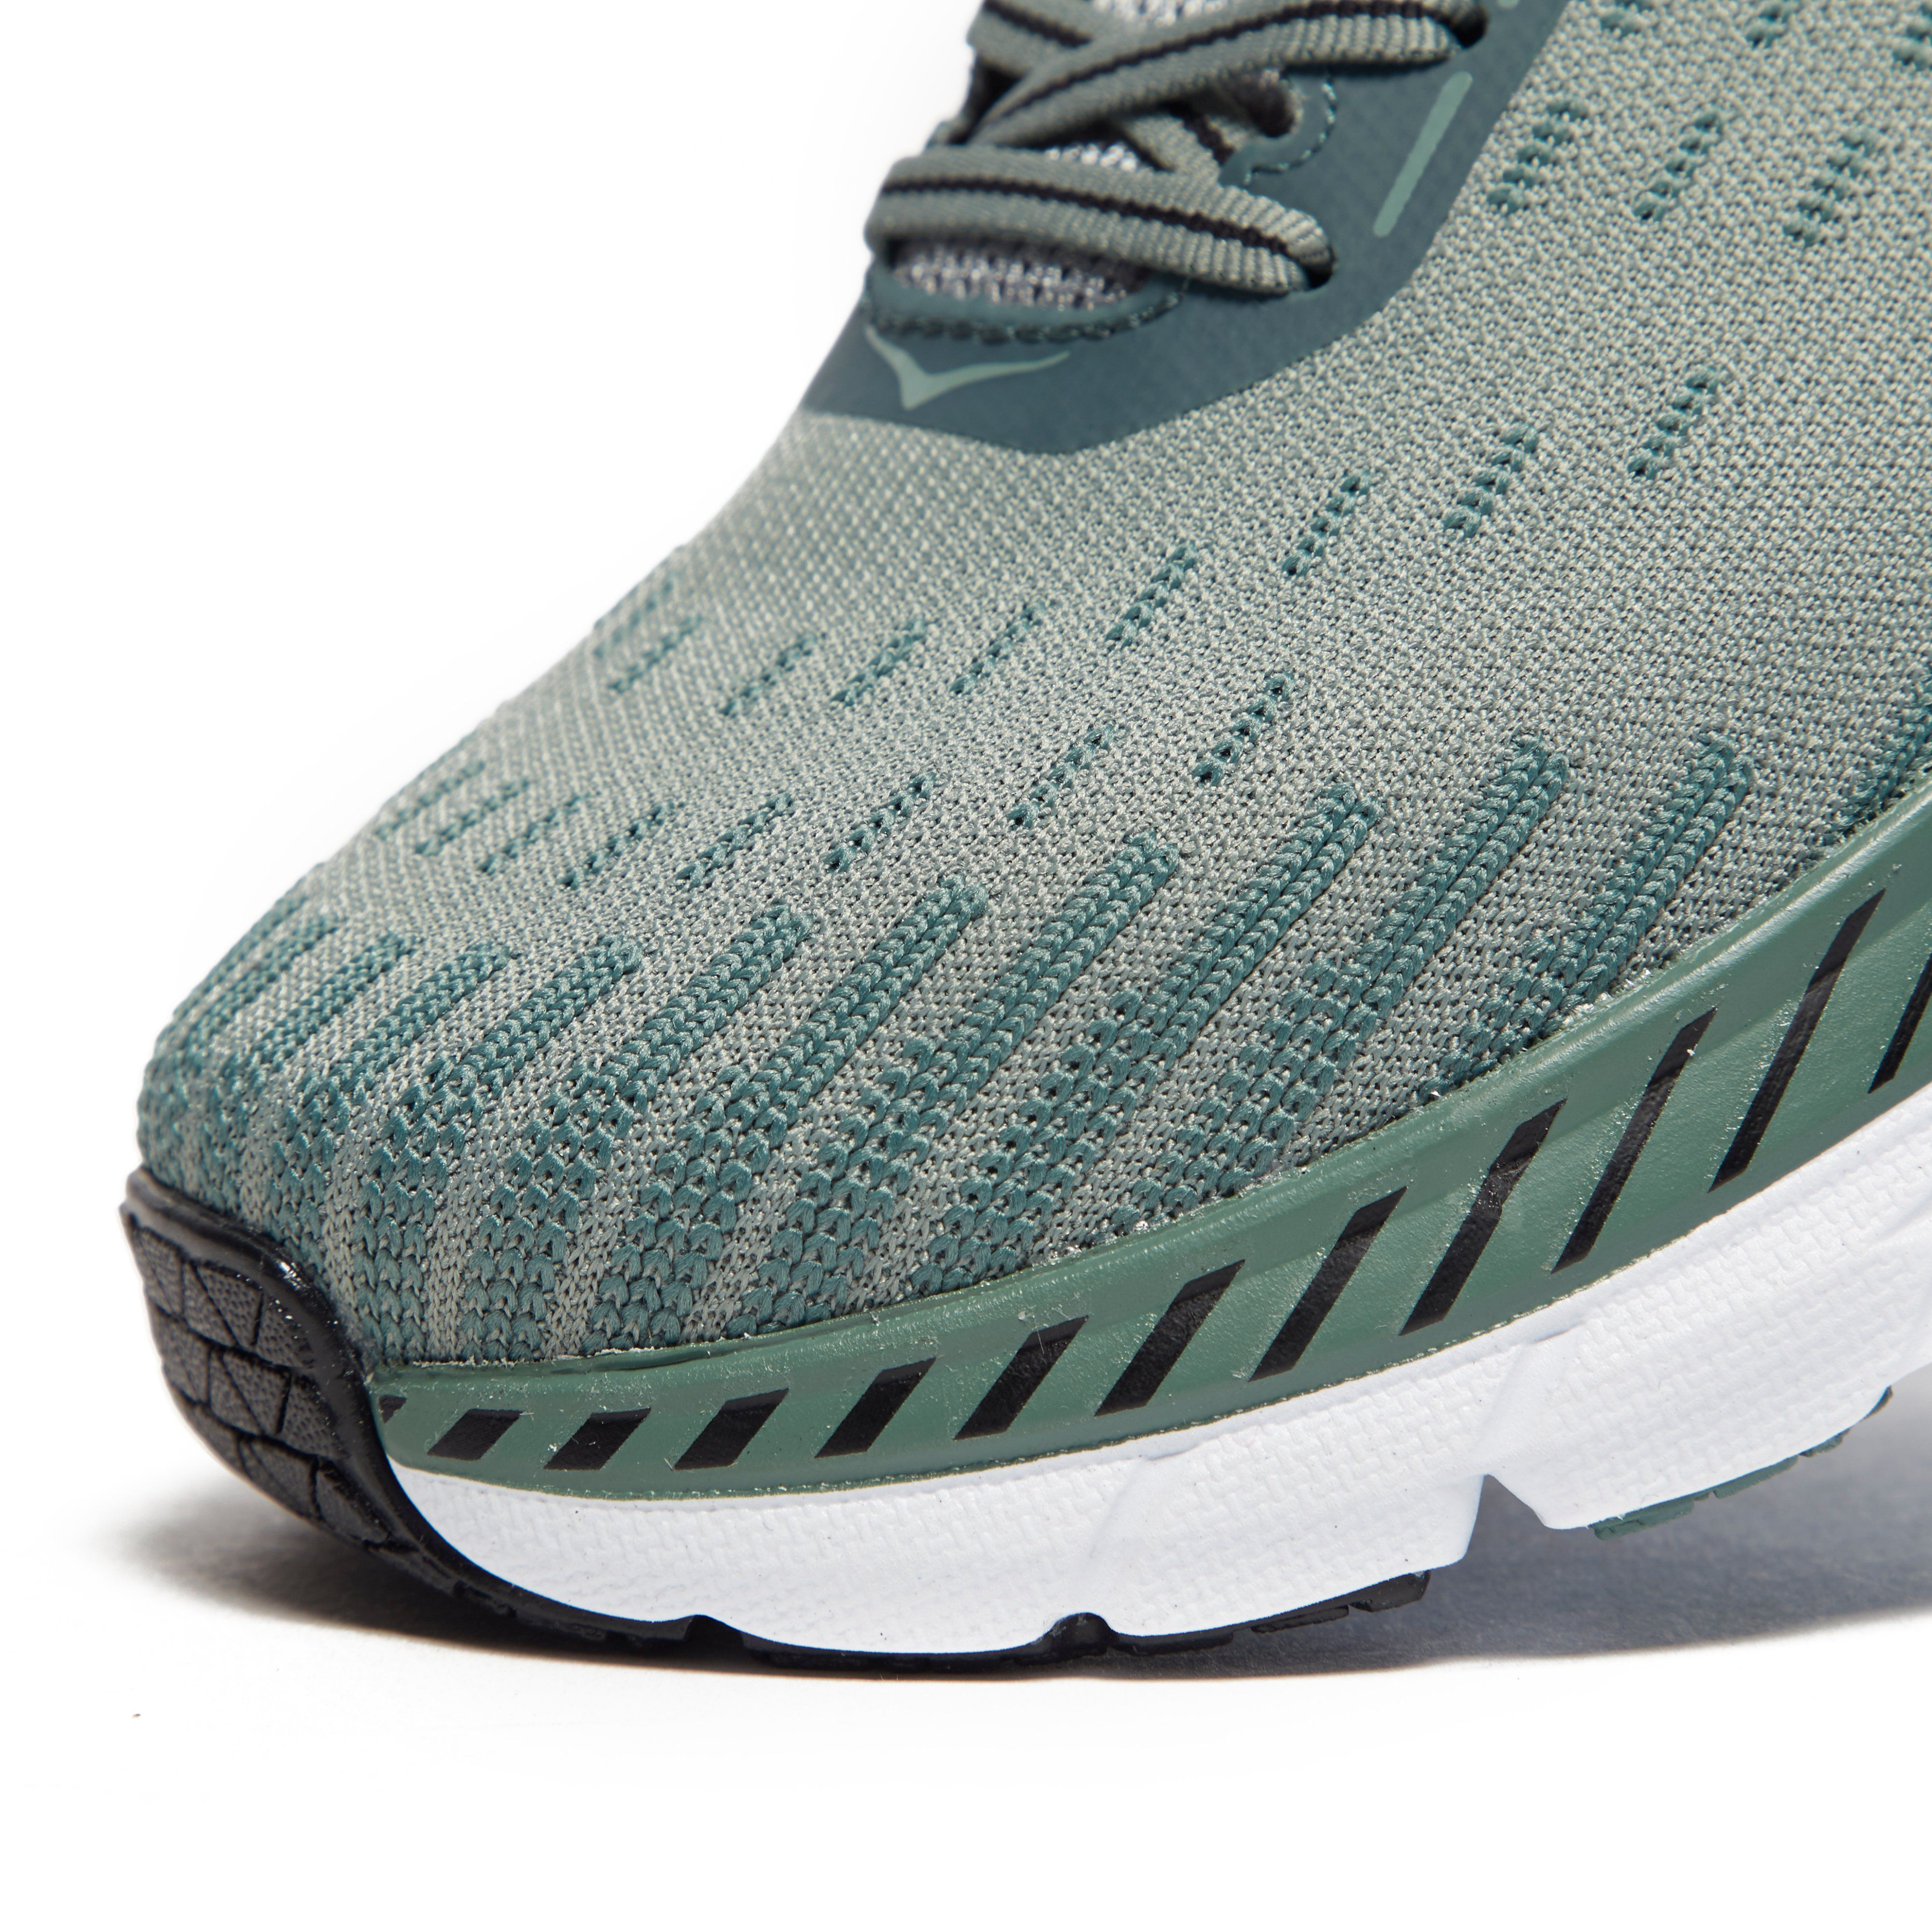 Hoka One One Clifton 5 Knit Men's Running Shoes